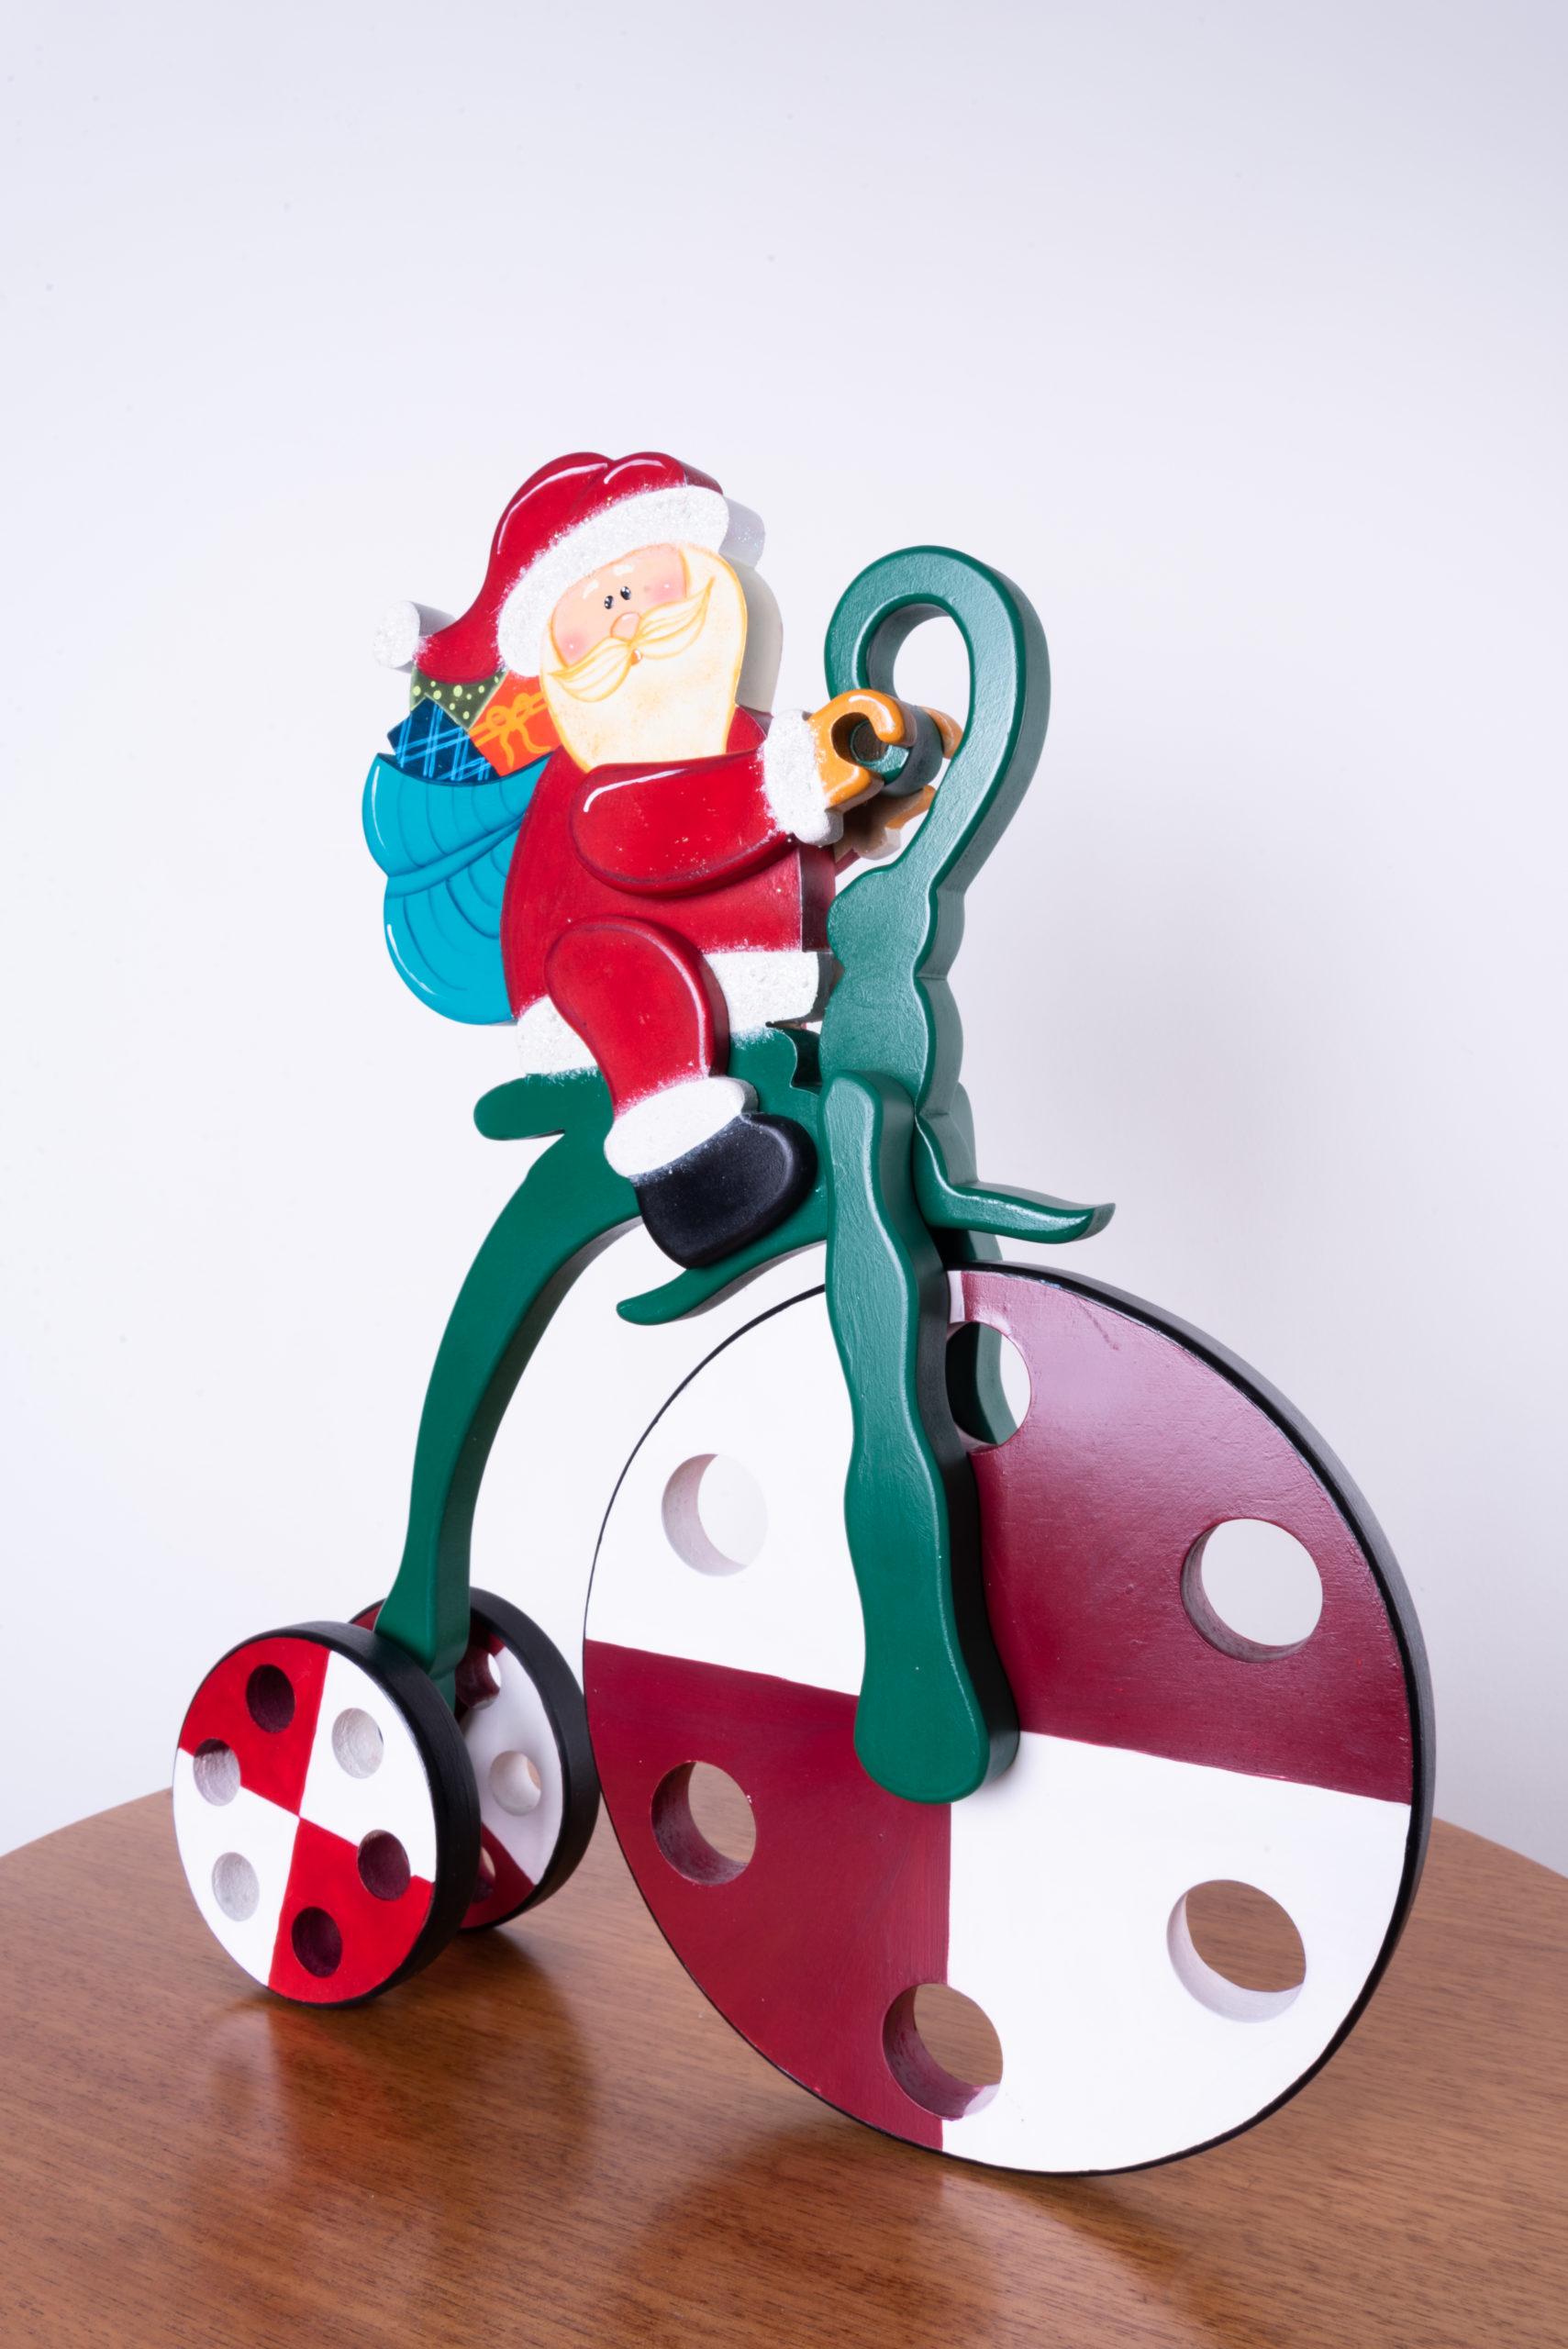 Papá Noel en bicicletra navideño country